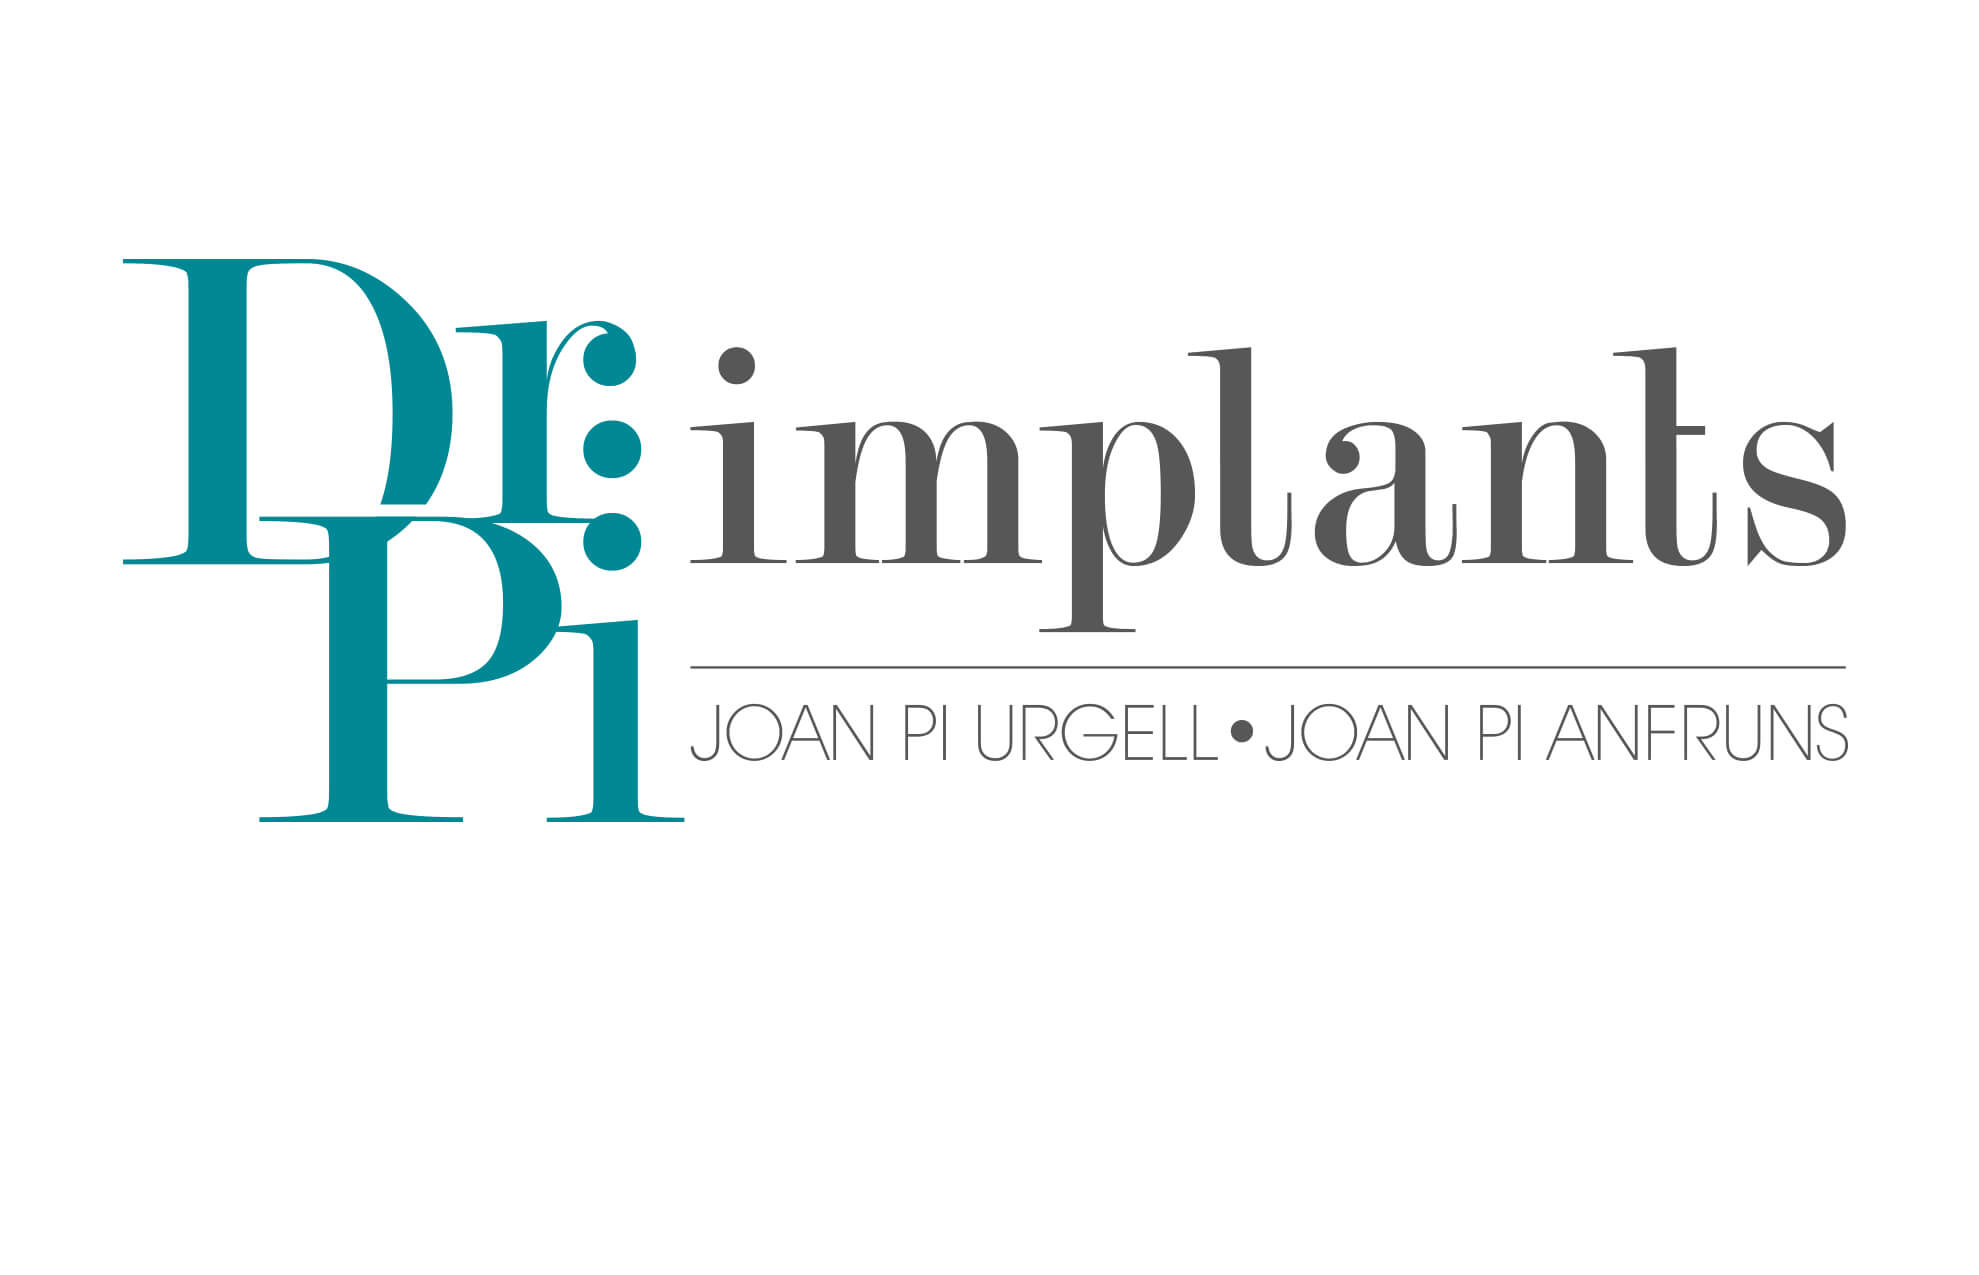 Dr Pi logotipo restyling branding1 - Restyling. Branding. Odontología